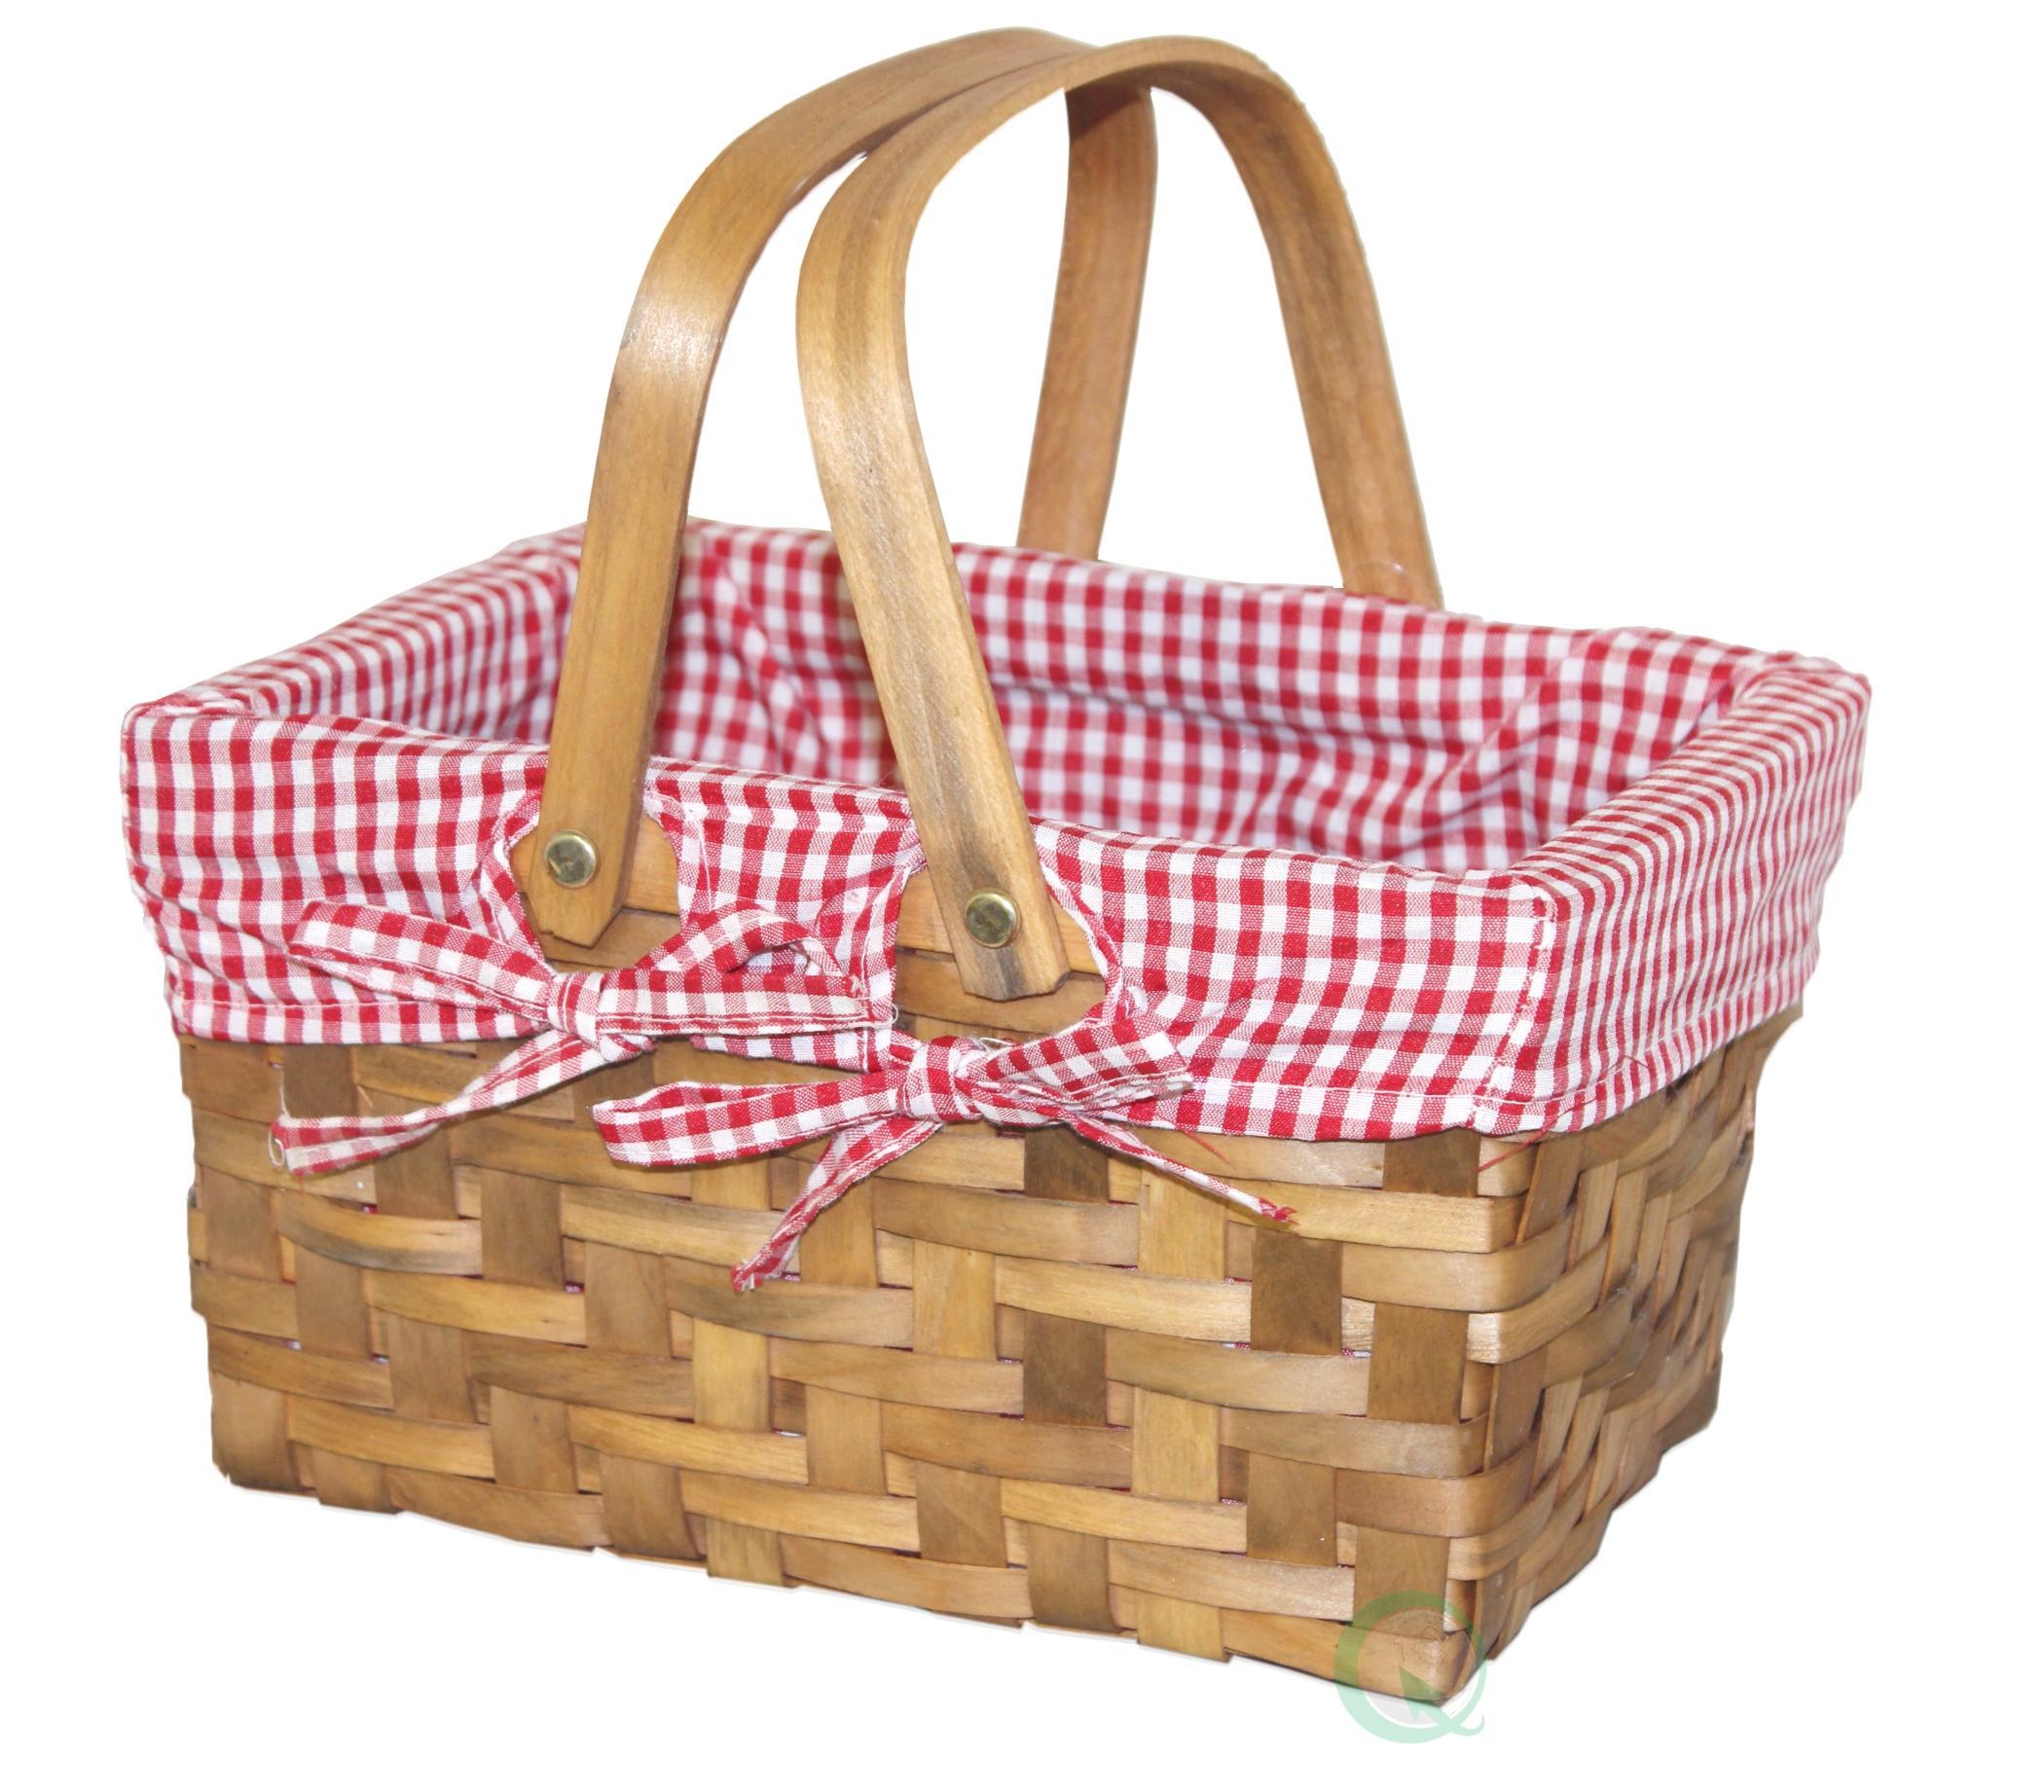 Amazon.com : Vintiquewise TM Rectangular Basket Lined with Gingham ...